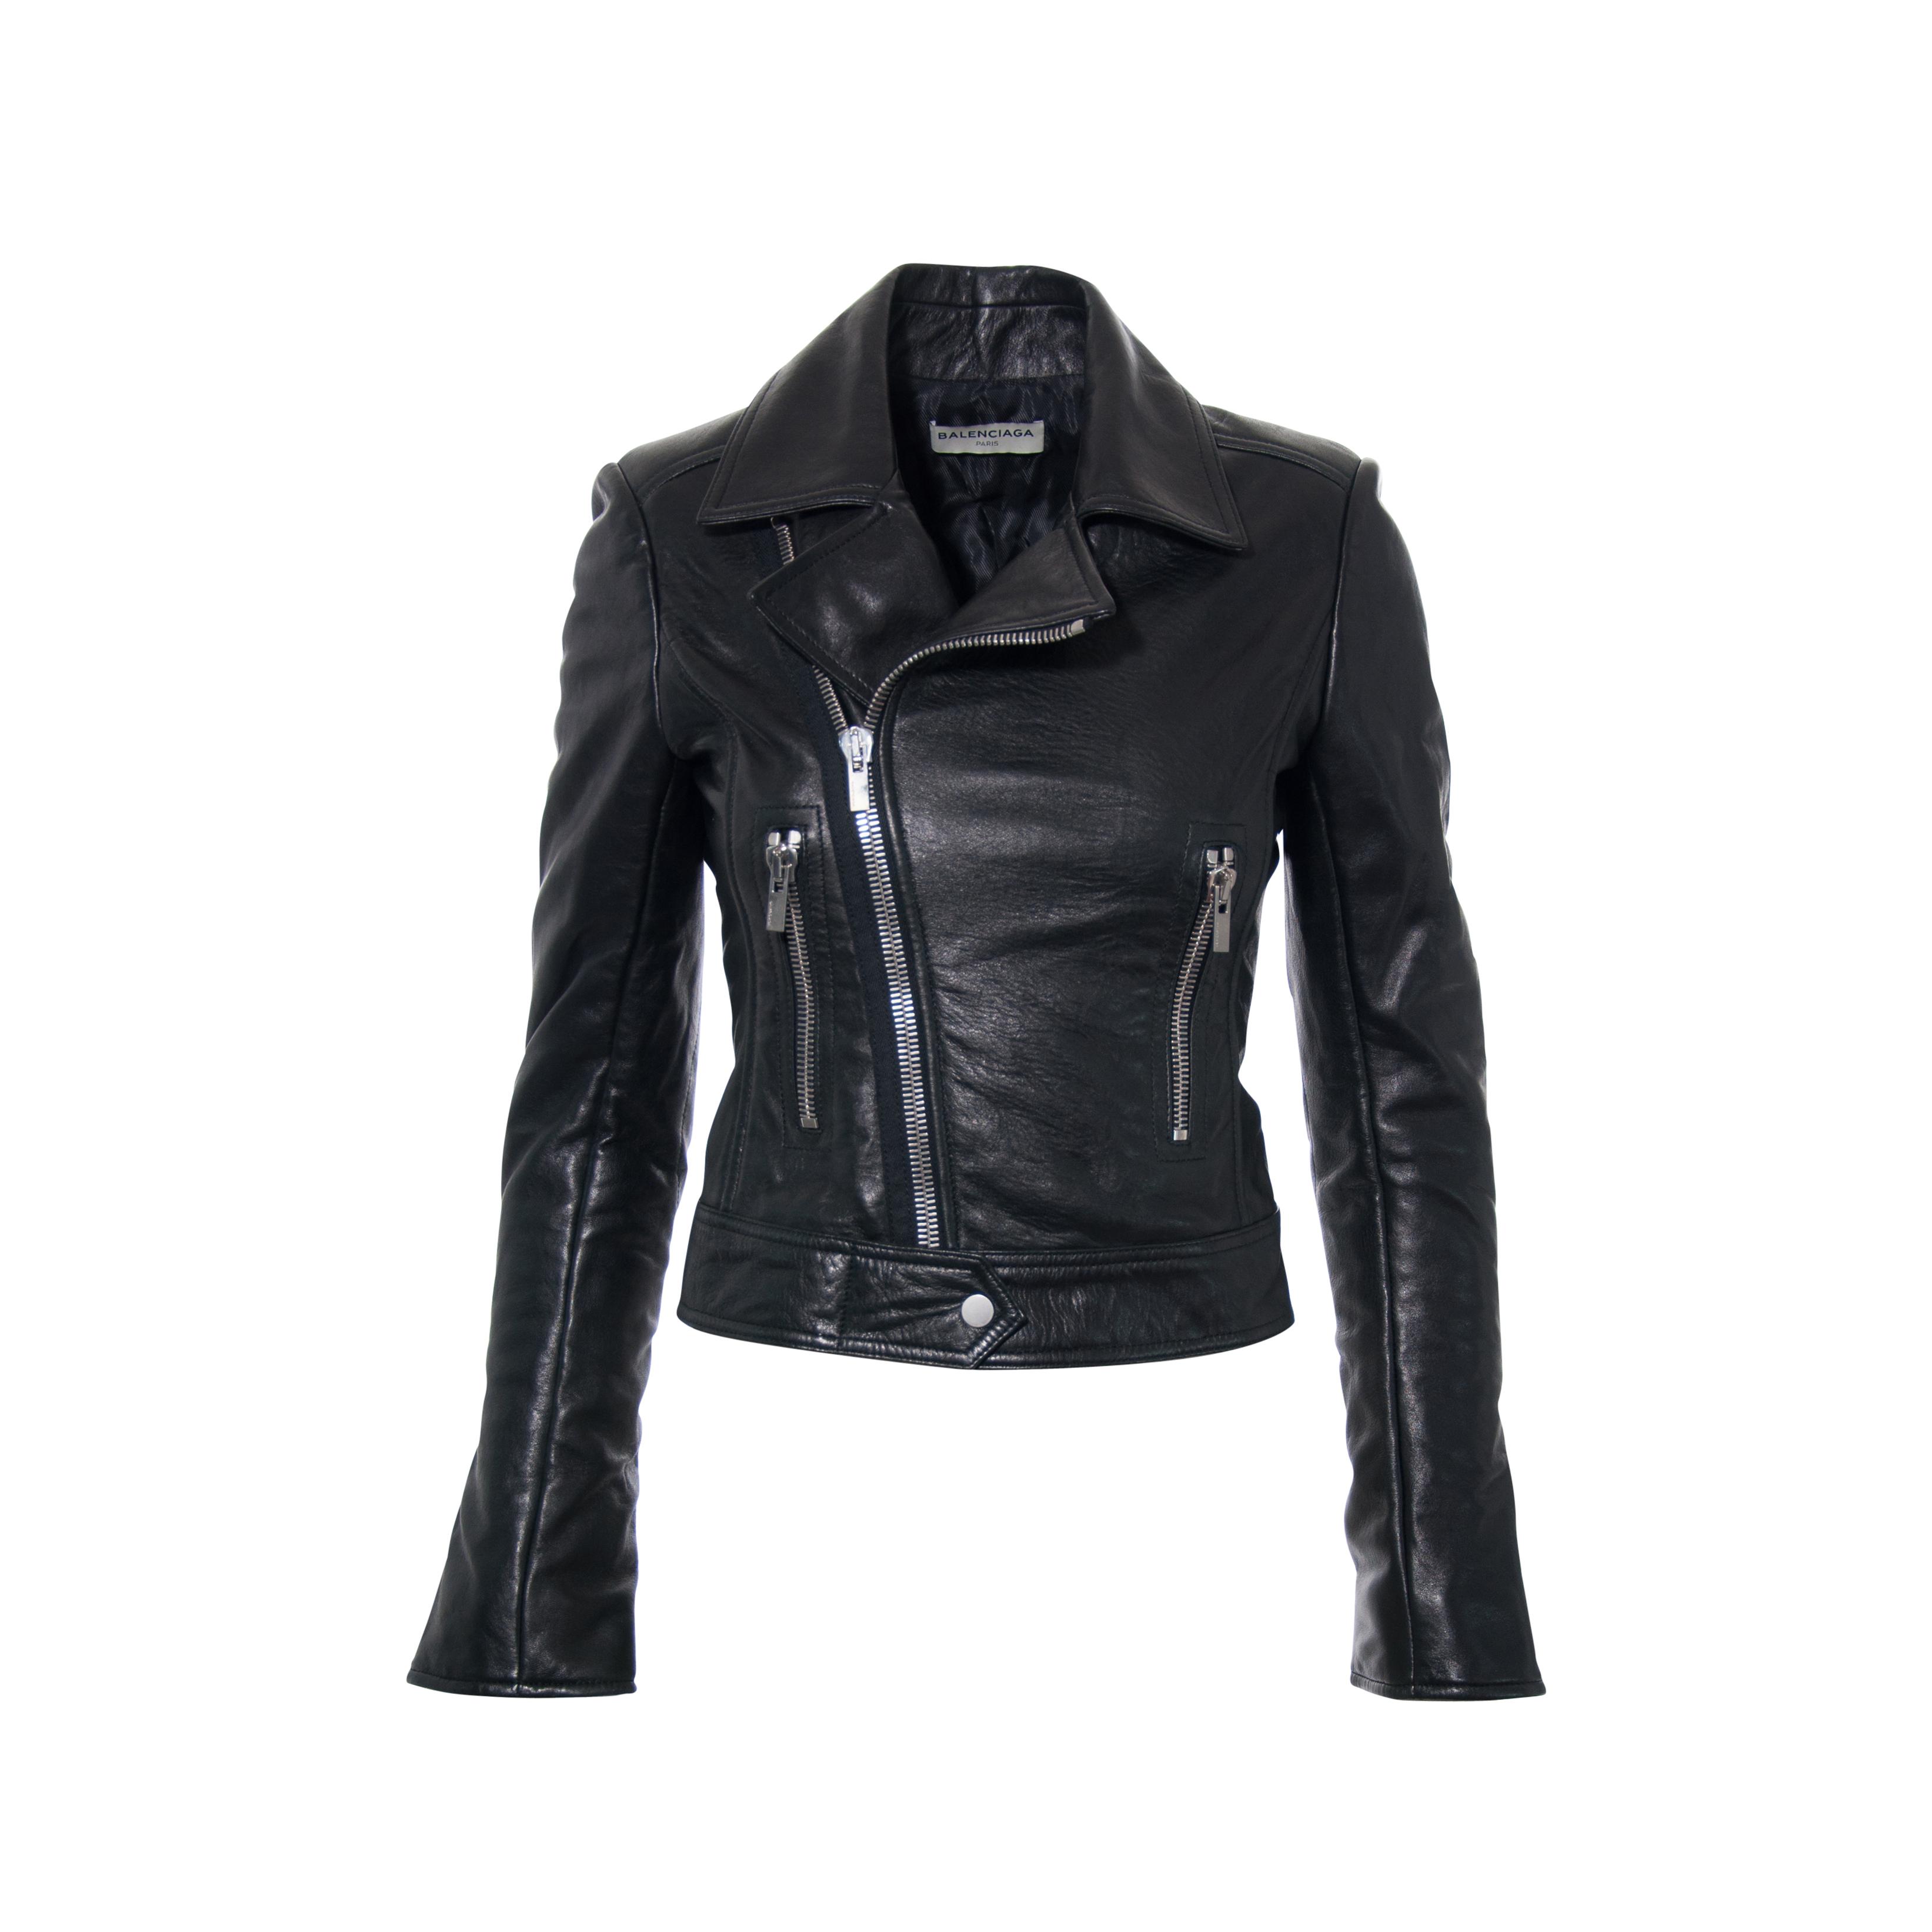 e0b2edb687ac Authentic Second Hand Balenciaga Biker Jacket (PSS-265-00123)